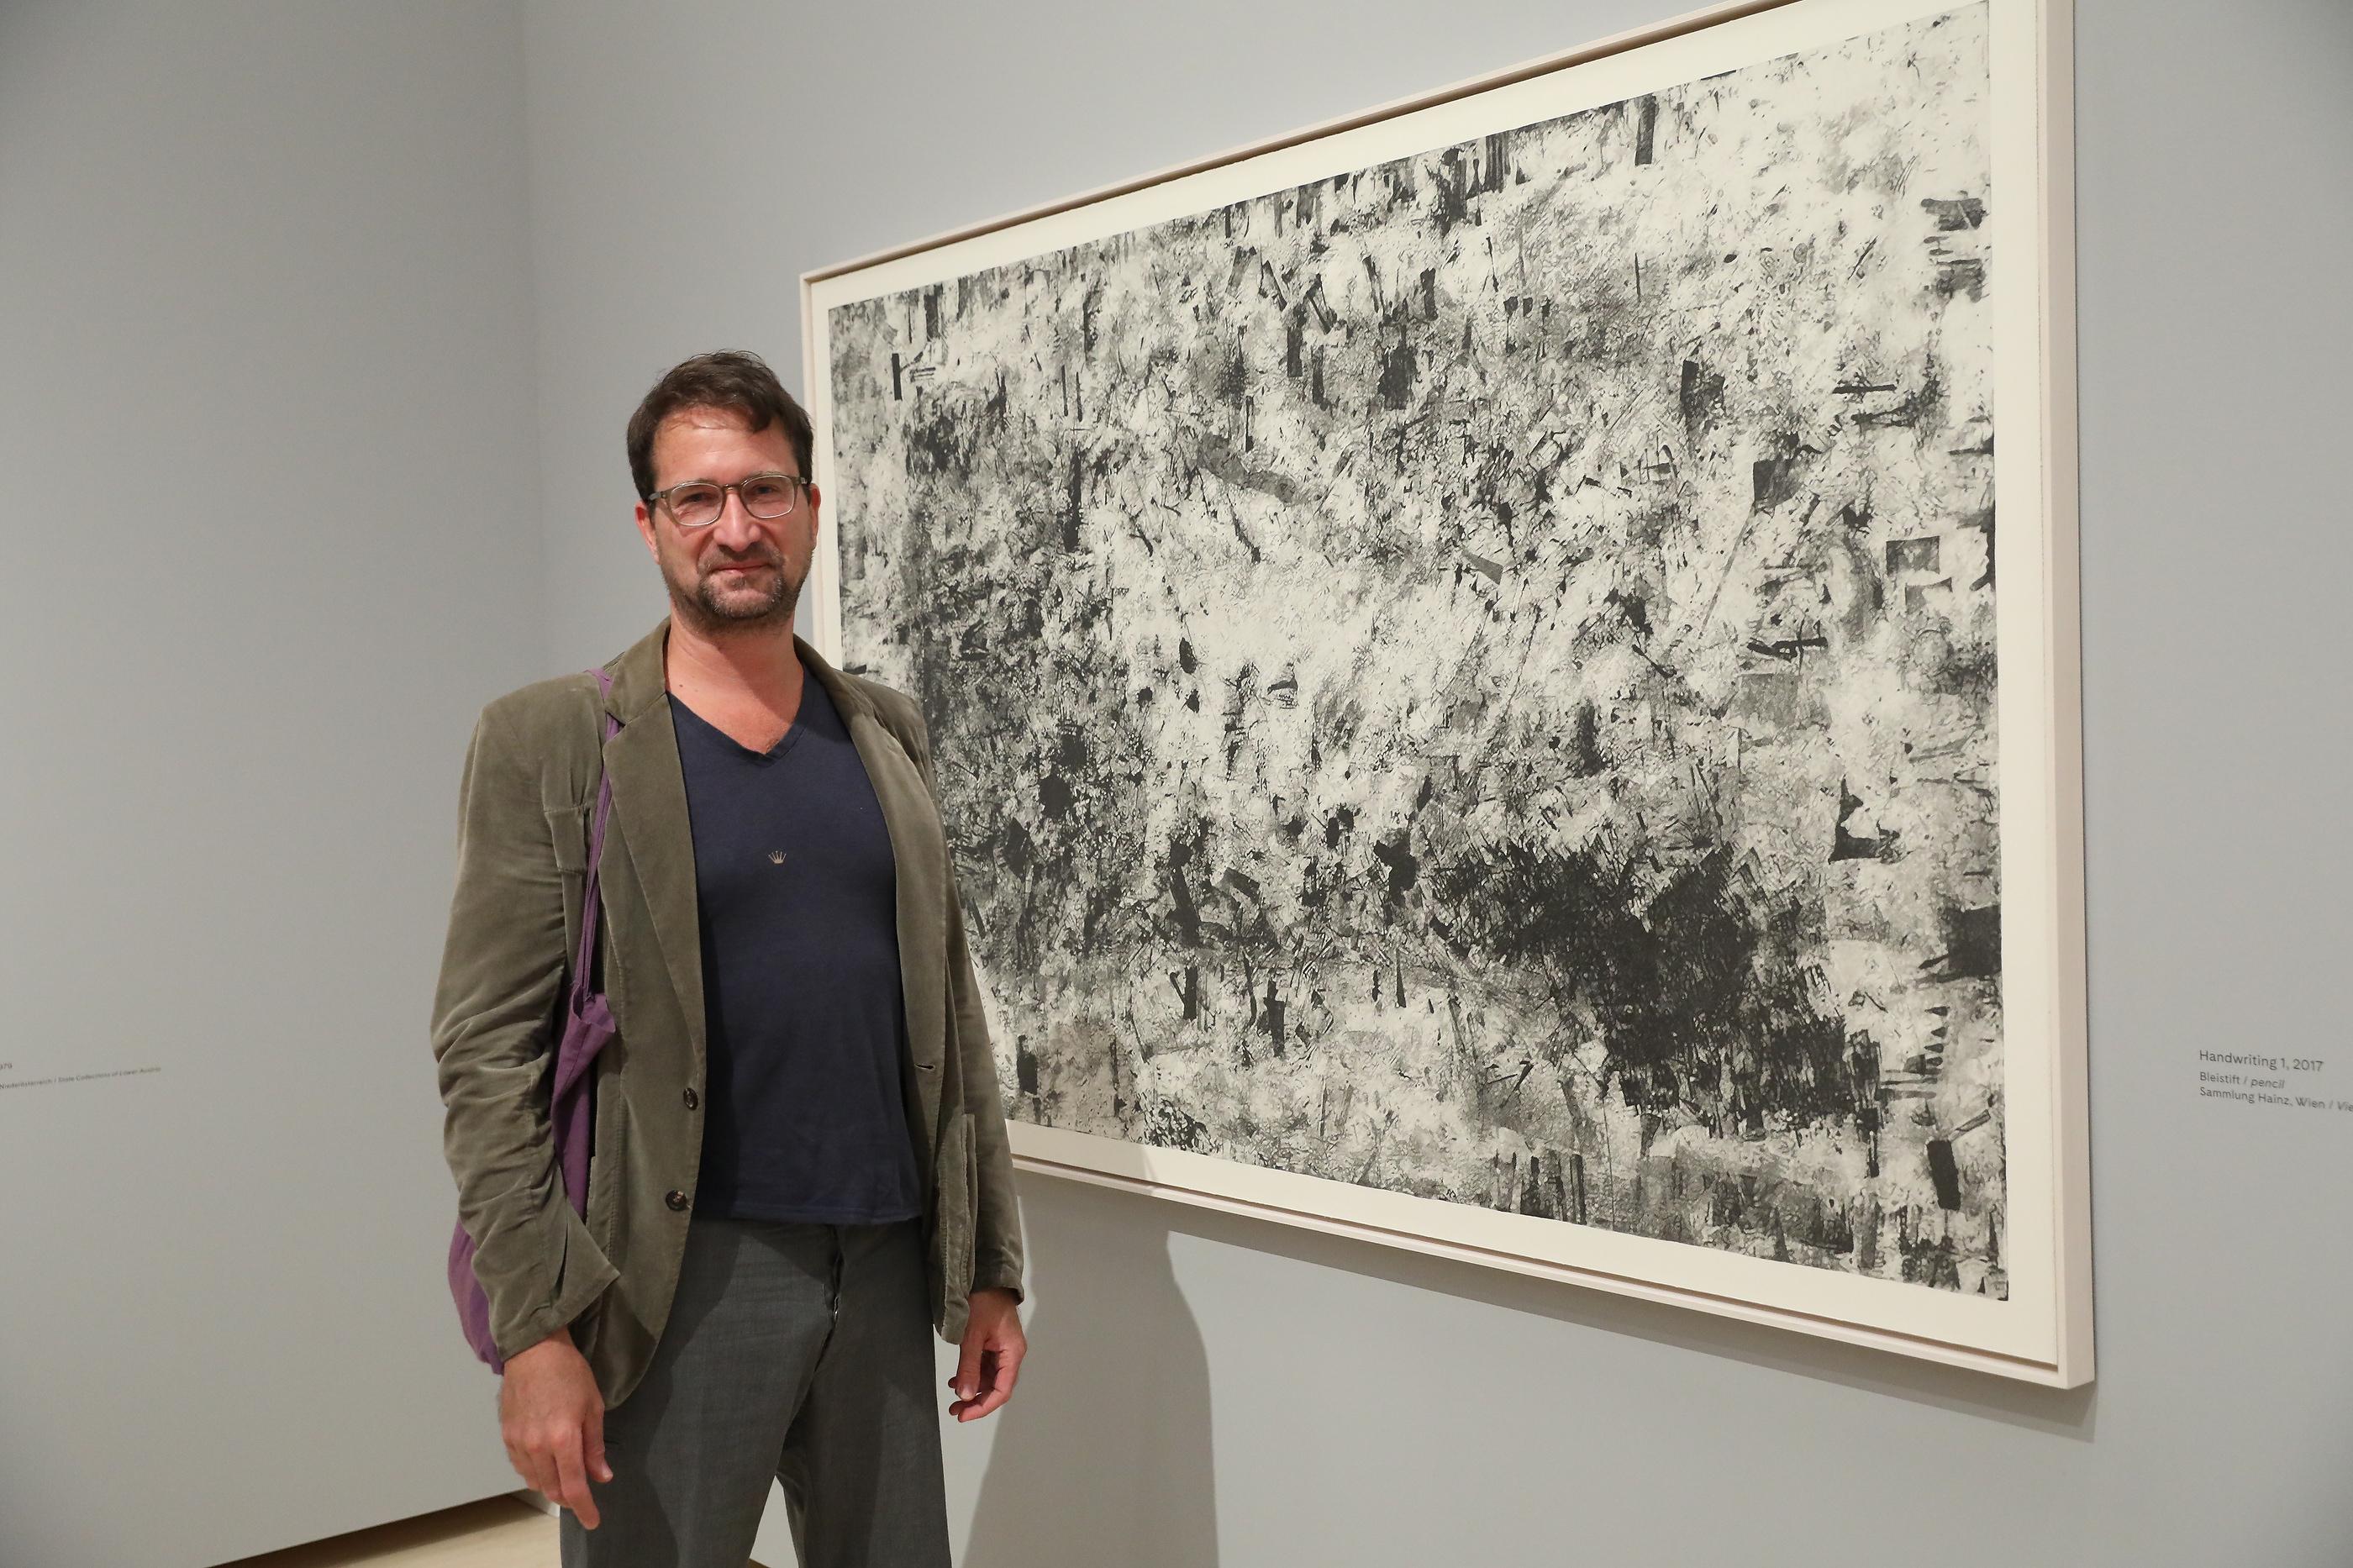 Klaus Mosettig (c) APA/Ludwig Schedl